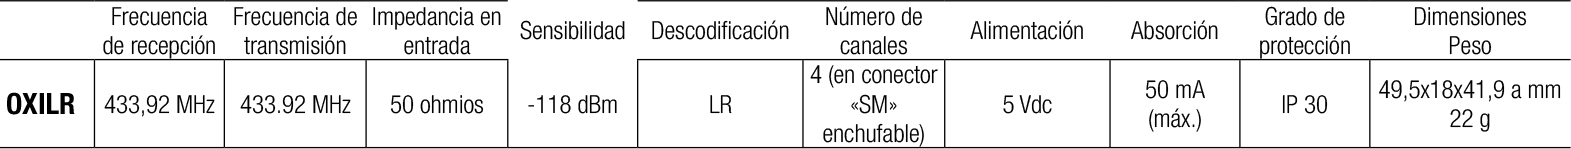 caracteristicas-oxilr